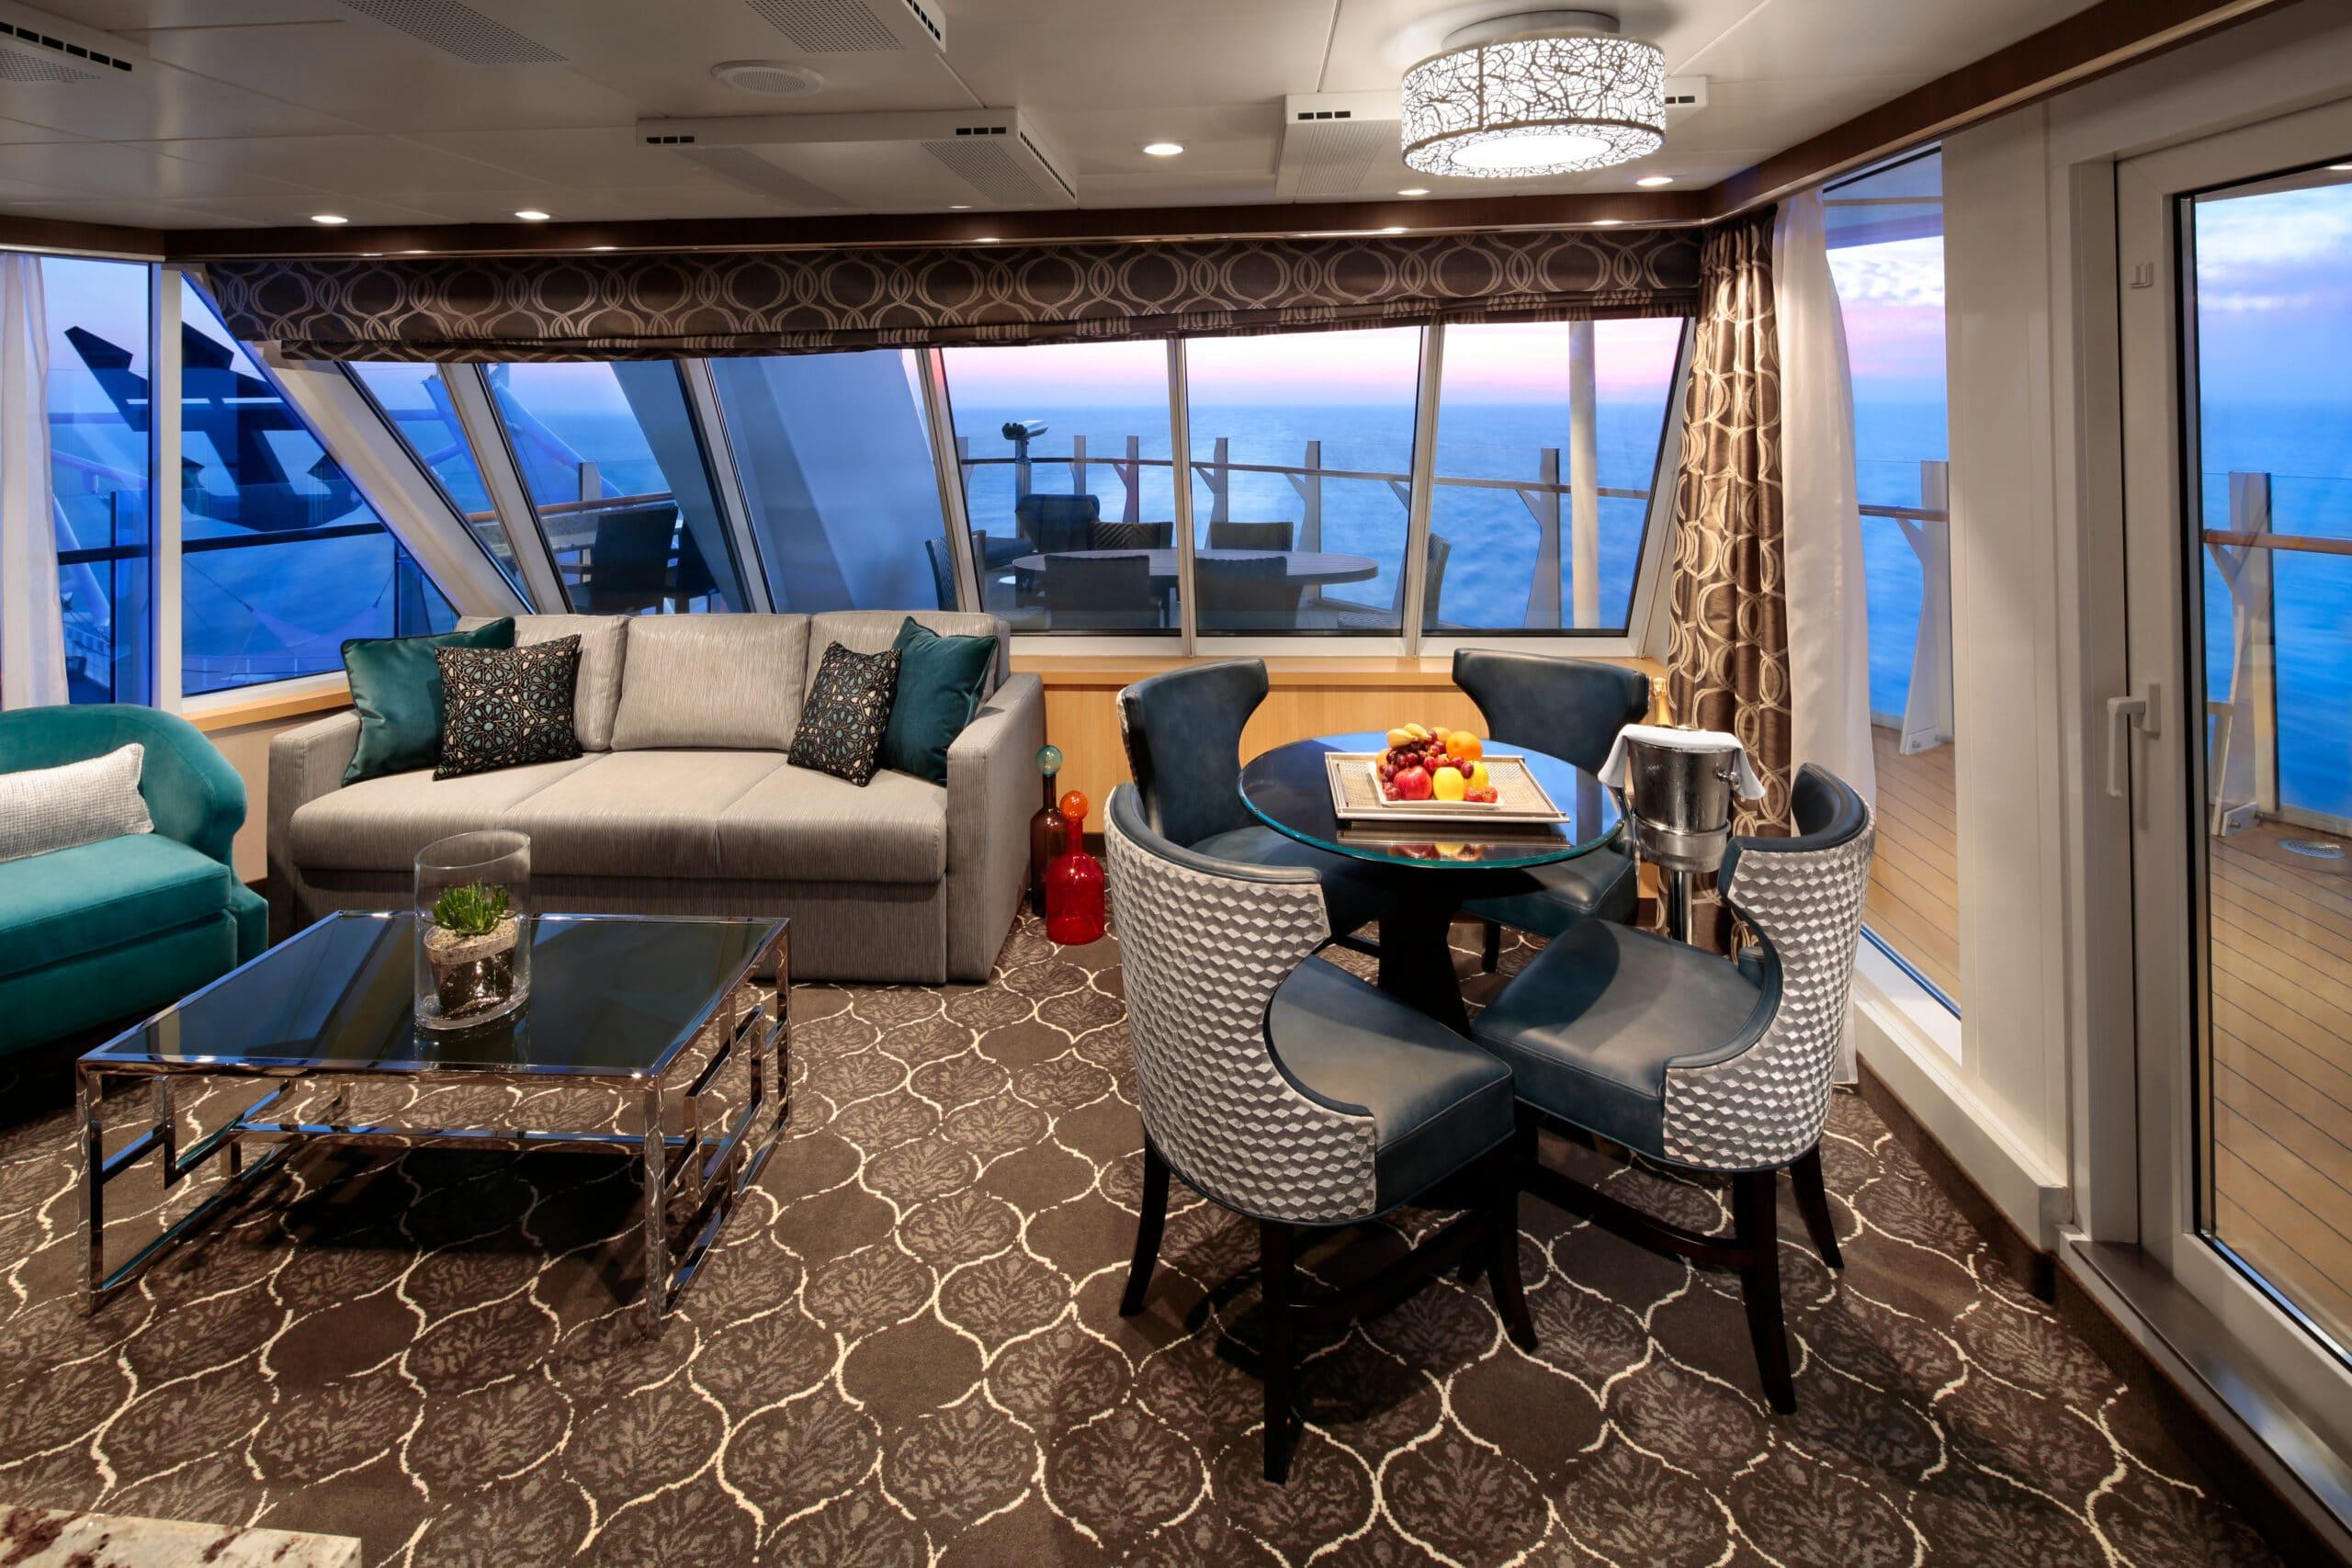 Royal-Caribbean-International-Harmony-of-the-Seas-Symphony-of-the-seas-schip-cruiseschip-categorie-A2-Aqua-theather-met-2-slaapkamers